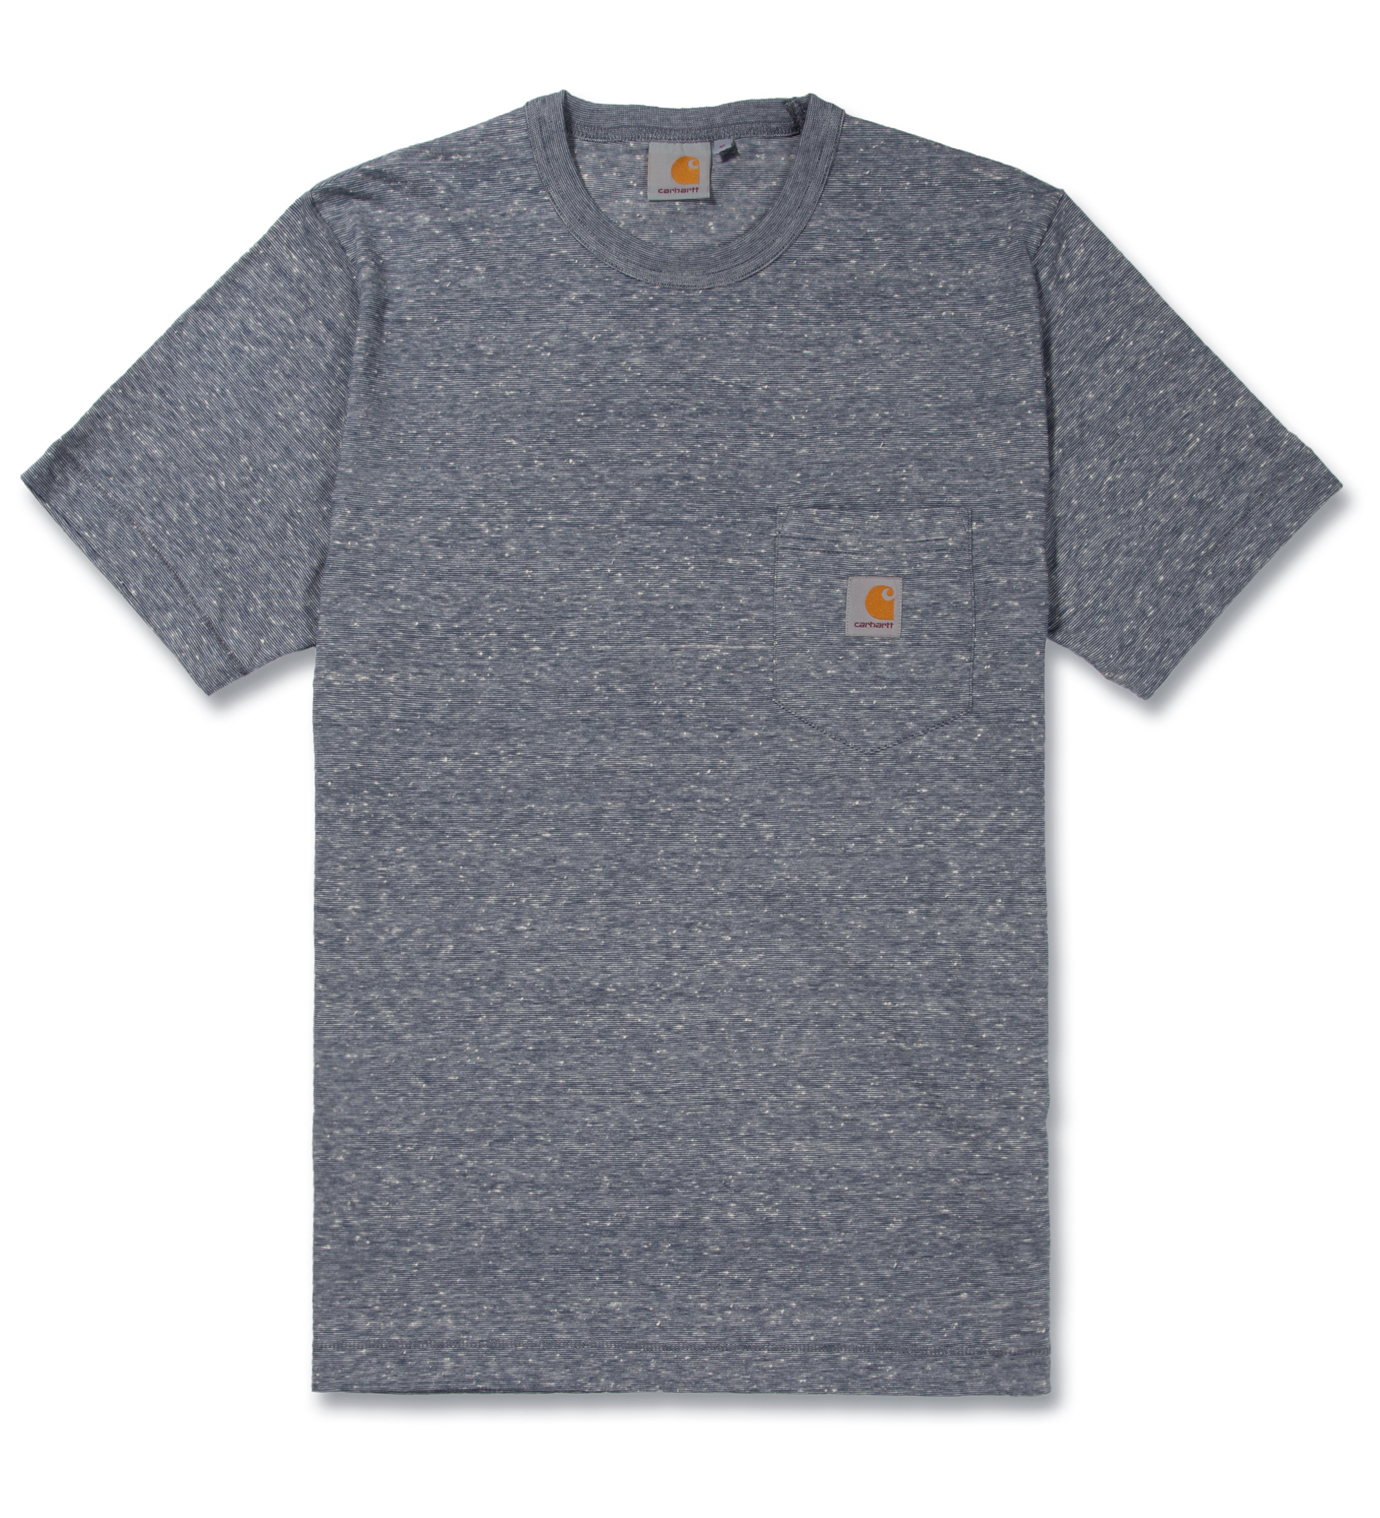 Carhartt WORK IN PROGRESS Federal American Heather Master Pocket T-Shirt